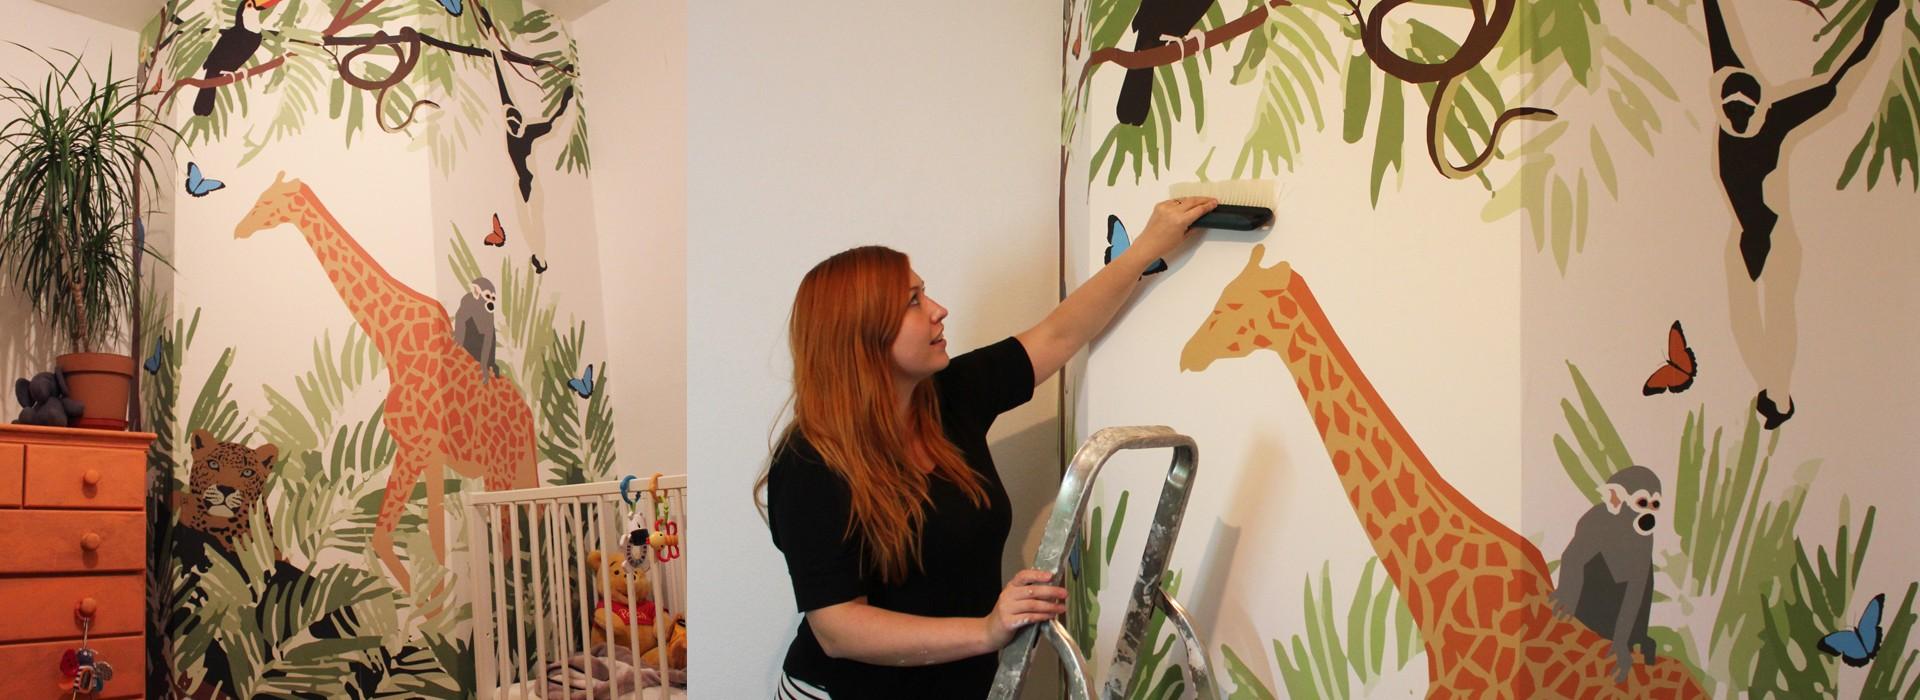 Freelance Wallpaper Designer UK Commissions Made to Order jungle mural